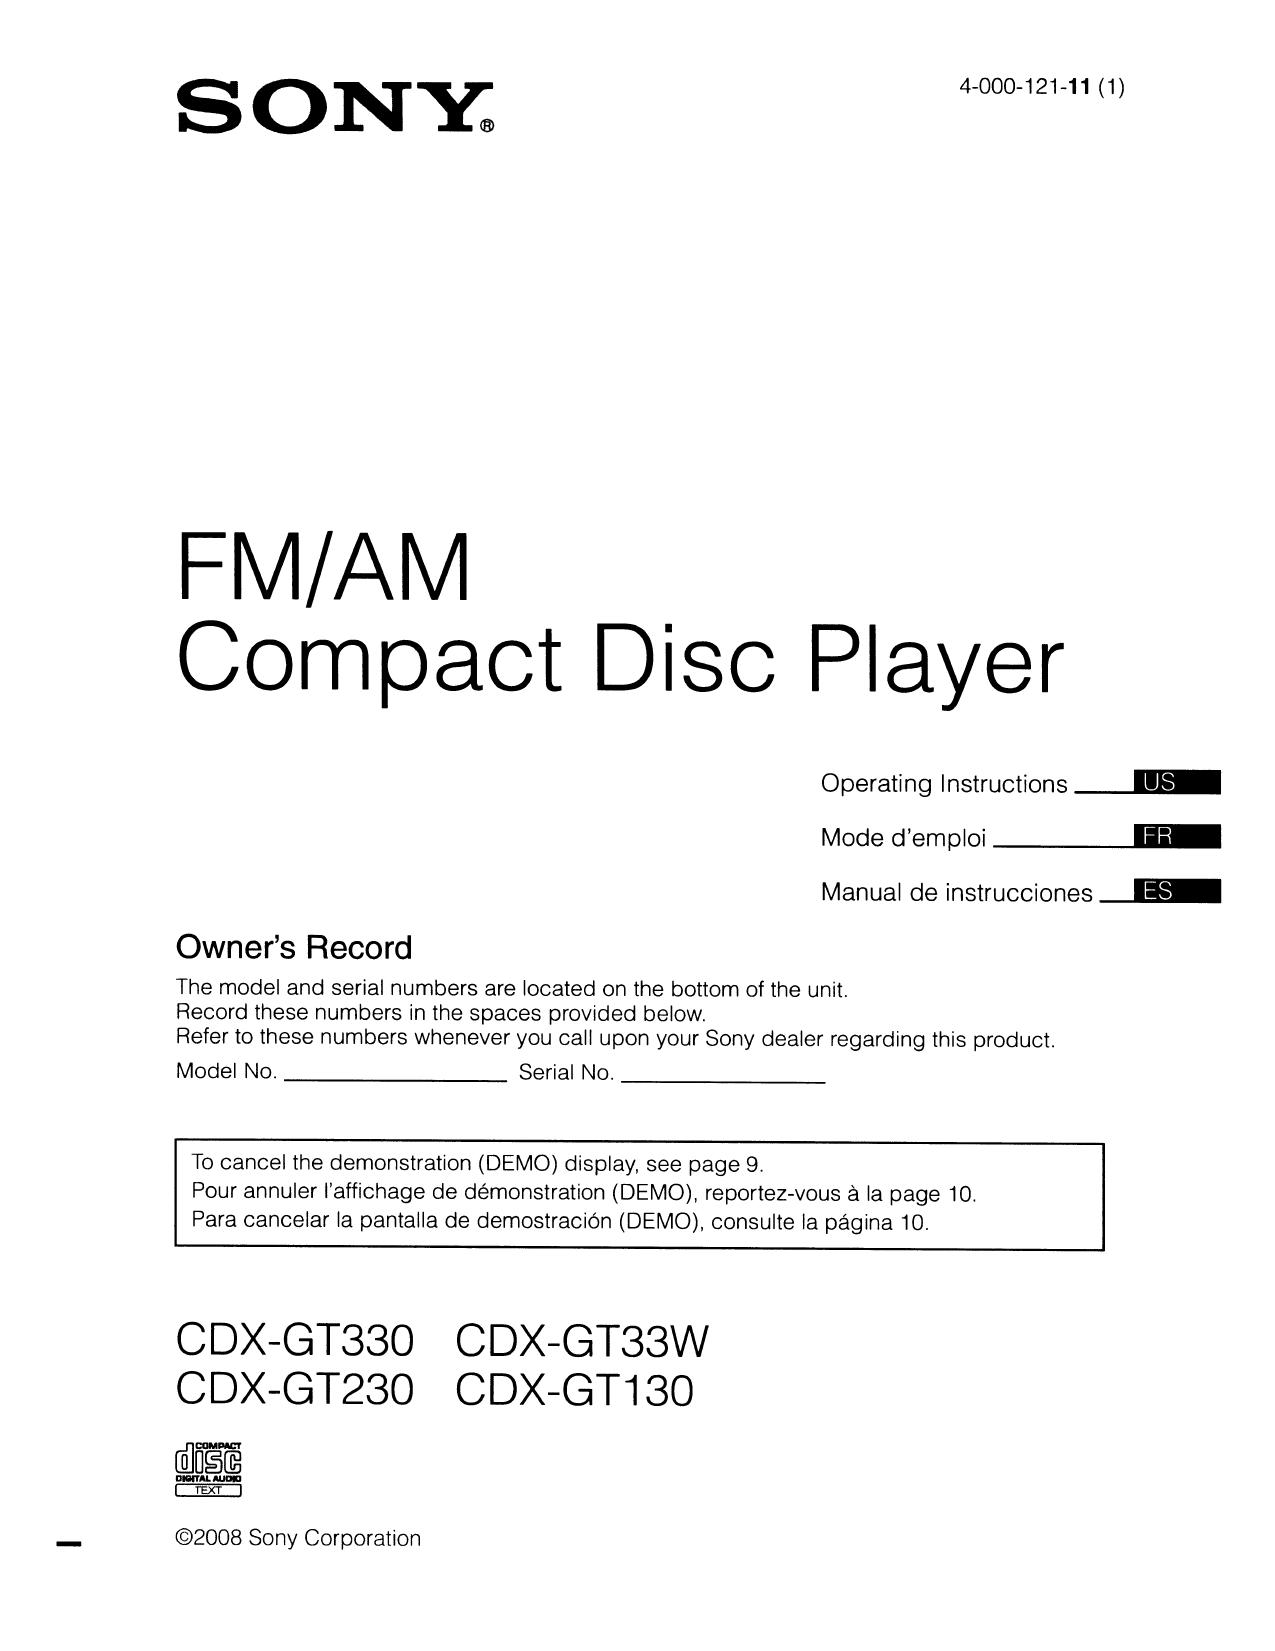 pdf for sony xplod cdx gt cd player manual pdf for sony cd player xplod cdx gt230 manual